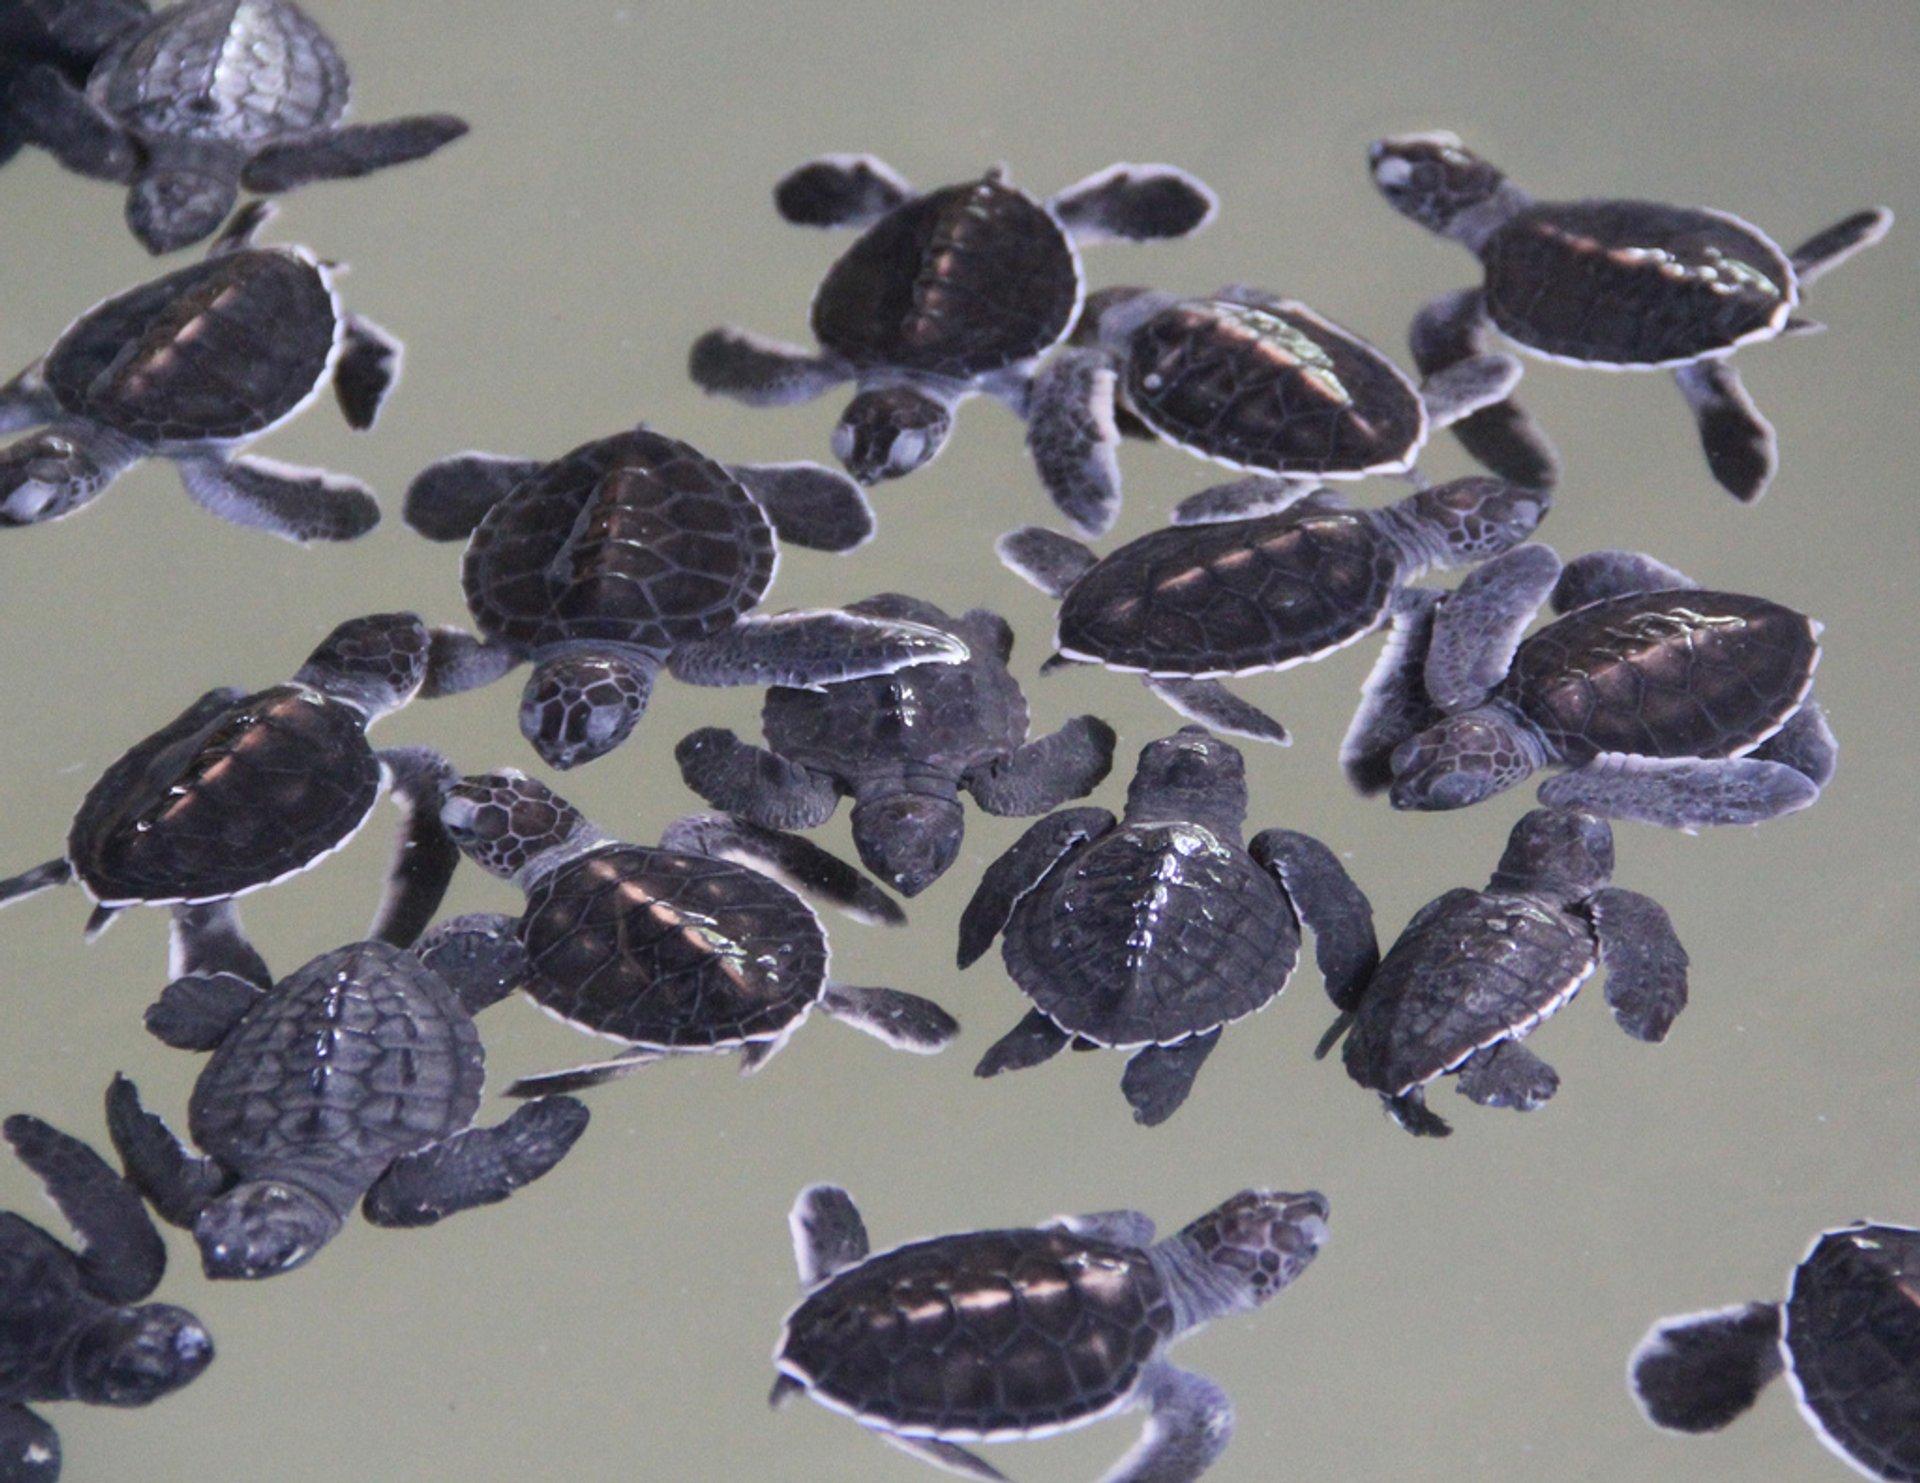 Turtle Sanctuary, Kosgoda 2020